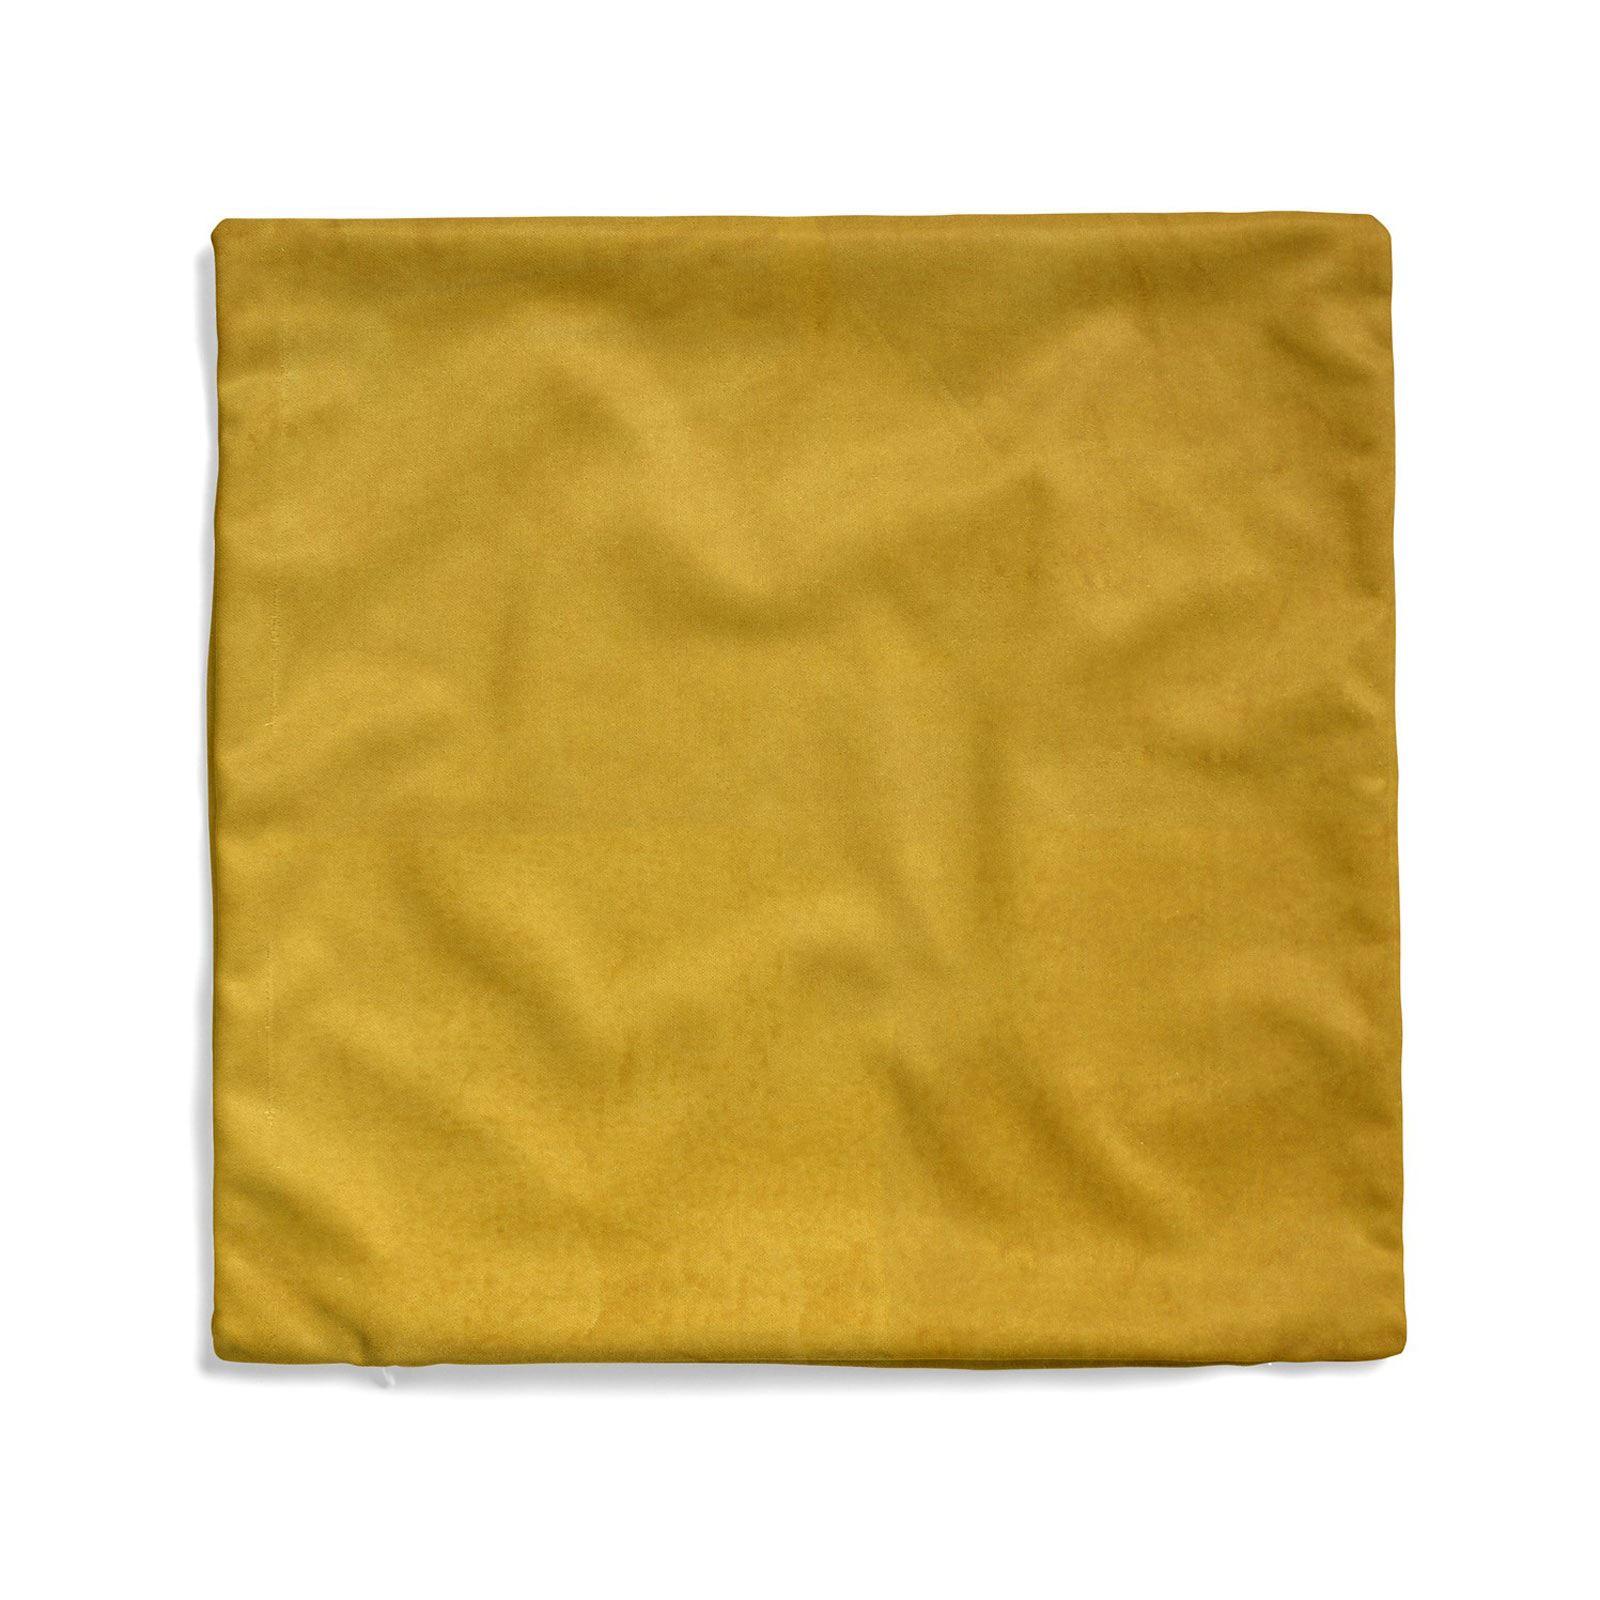 Ochre-Yellow-Silver-Mustard-Cushion-Covers-18-034-x-18-034-45cm-x-45cm-Cover